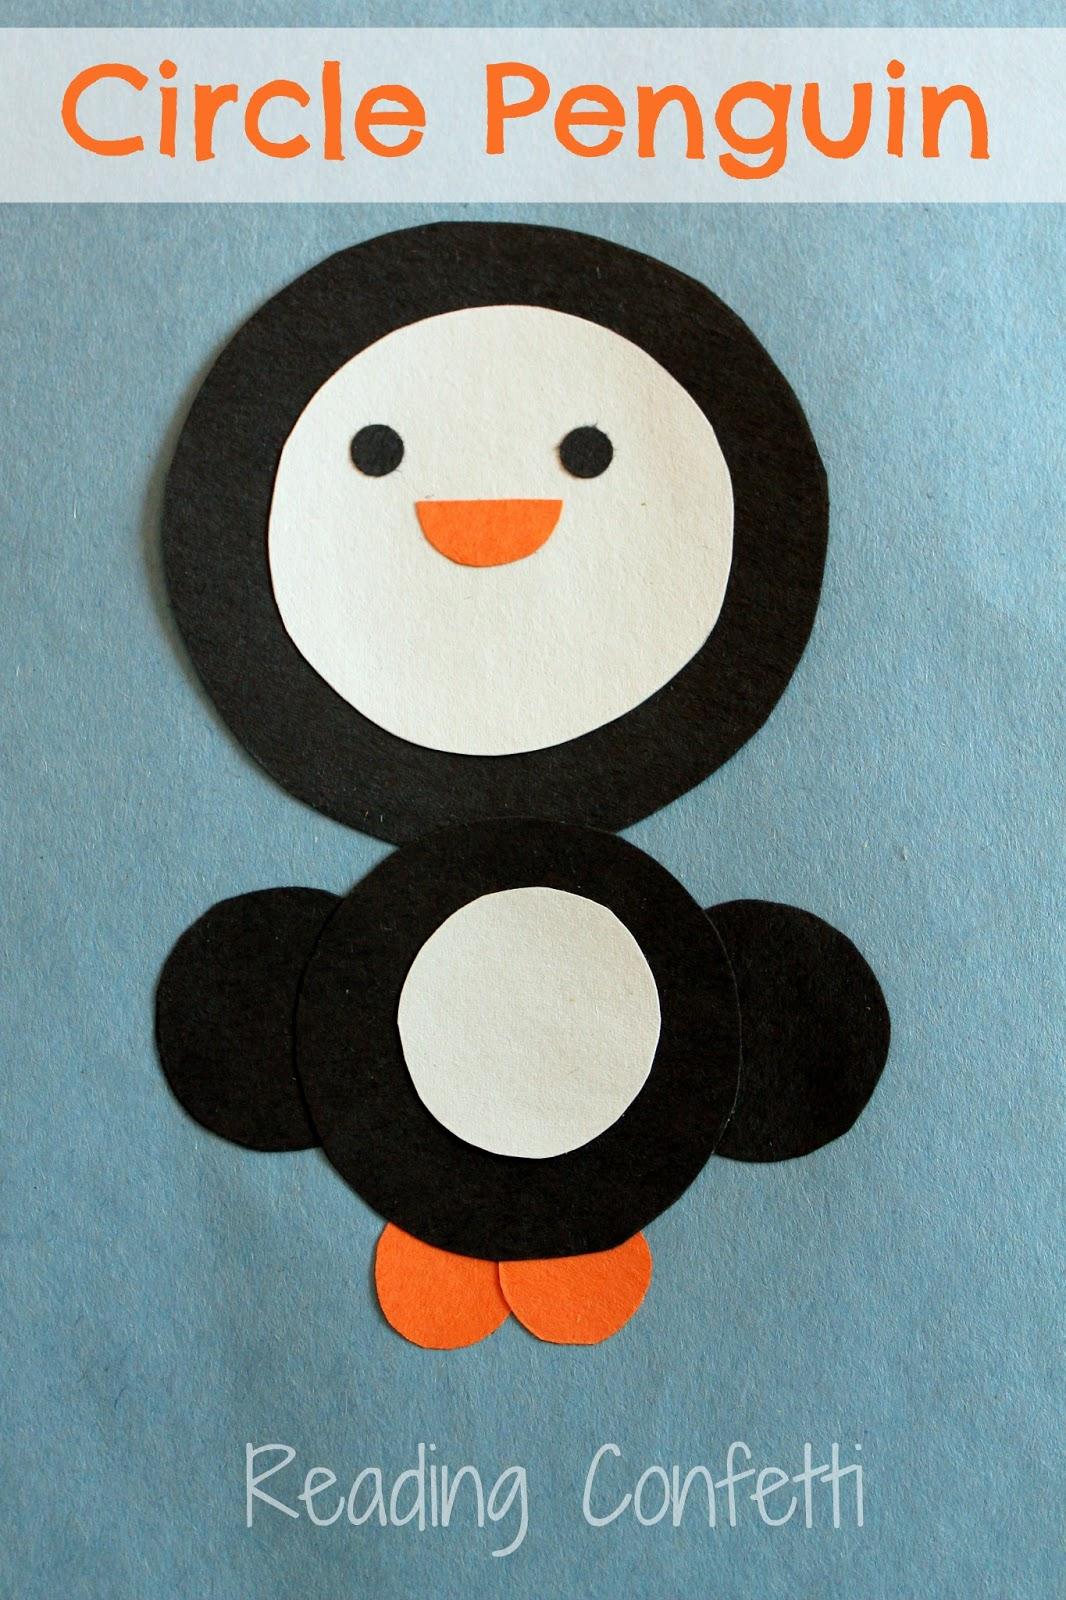 Circle Penguin Craft Reading Confetti